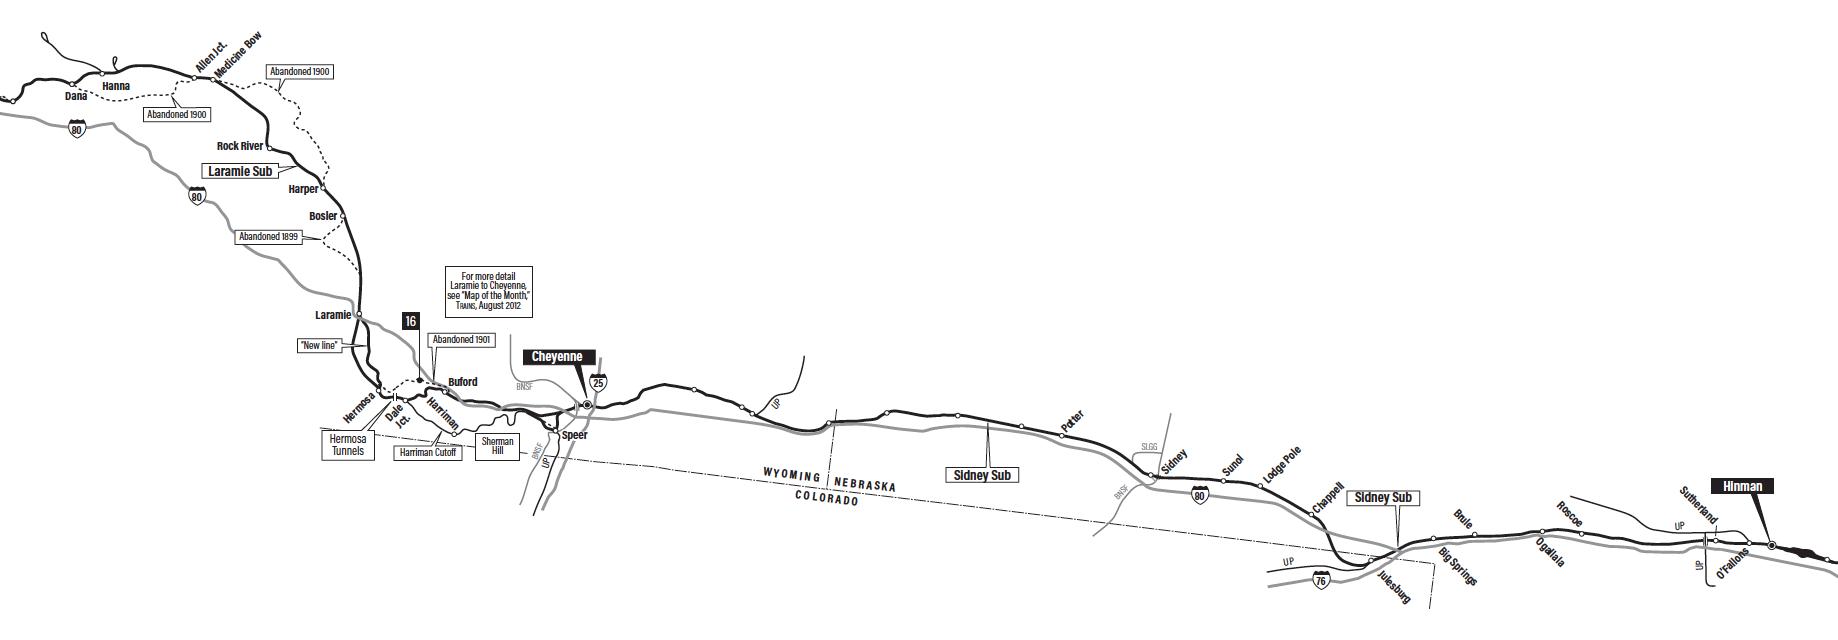 Transcontinental Railroad Map